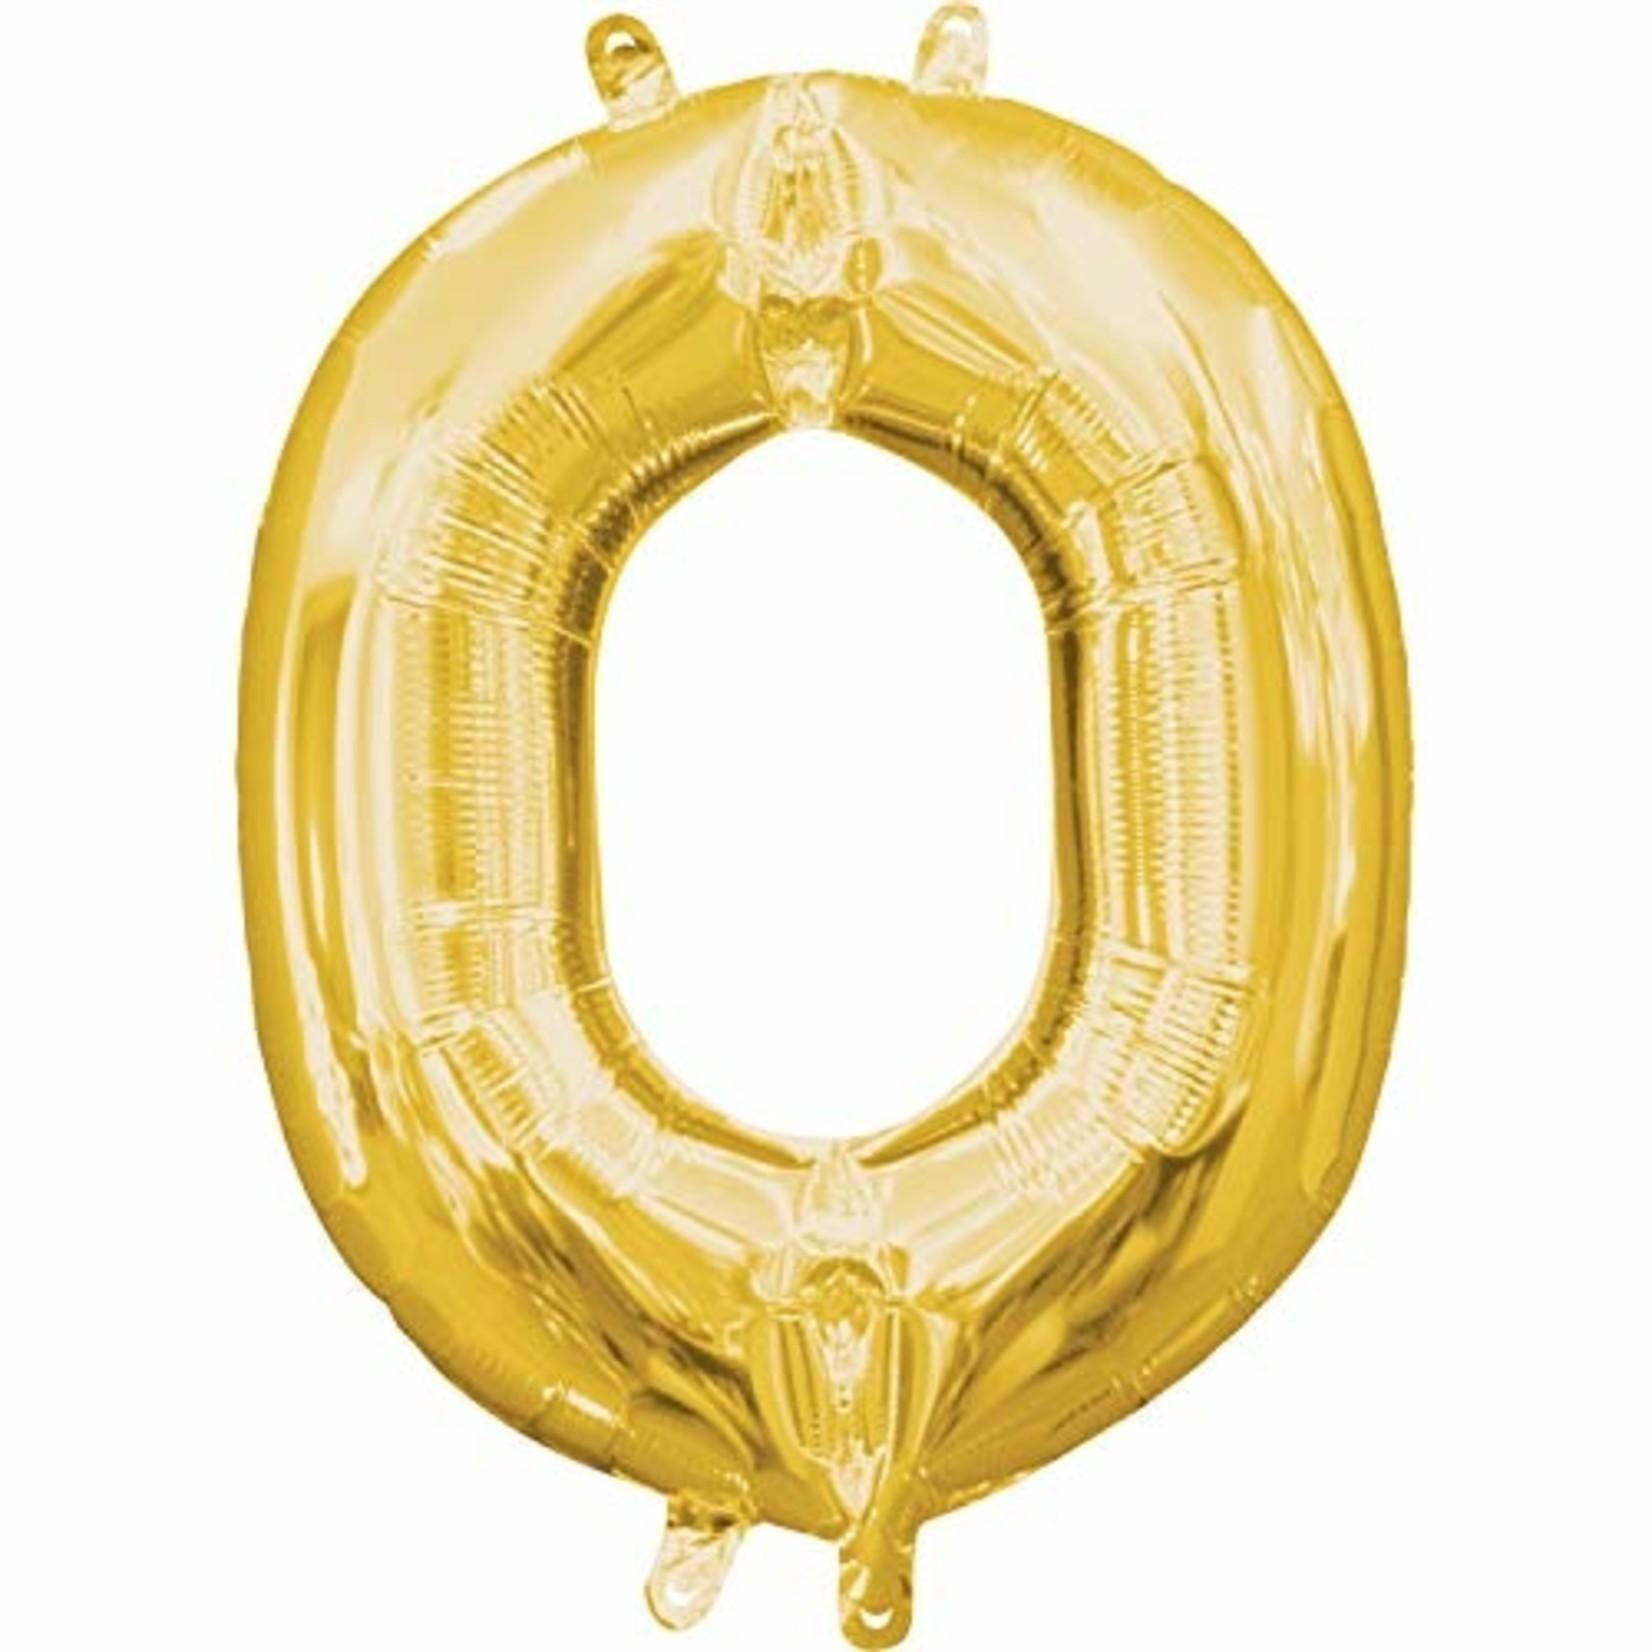 Air Filled Foil-O Gold